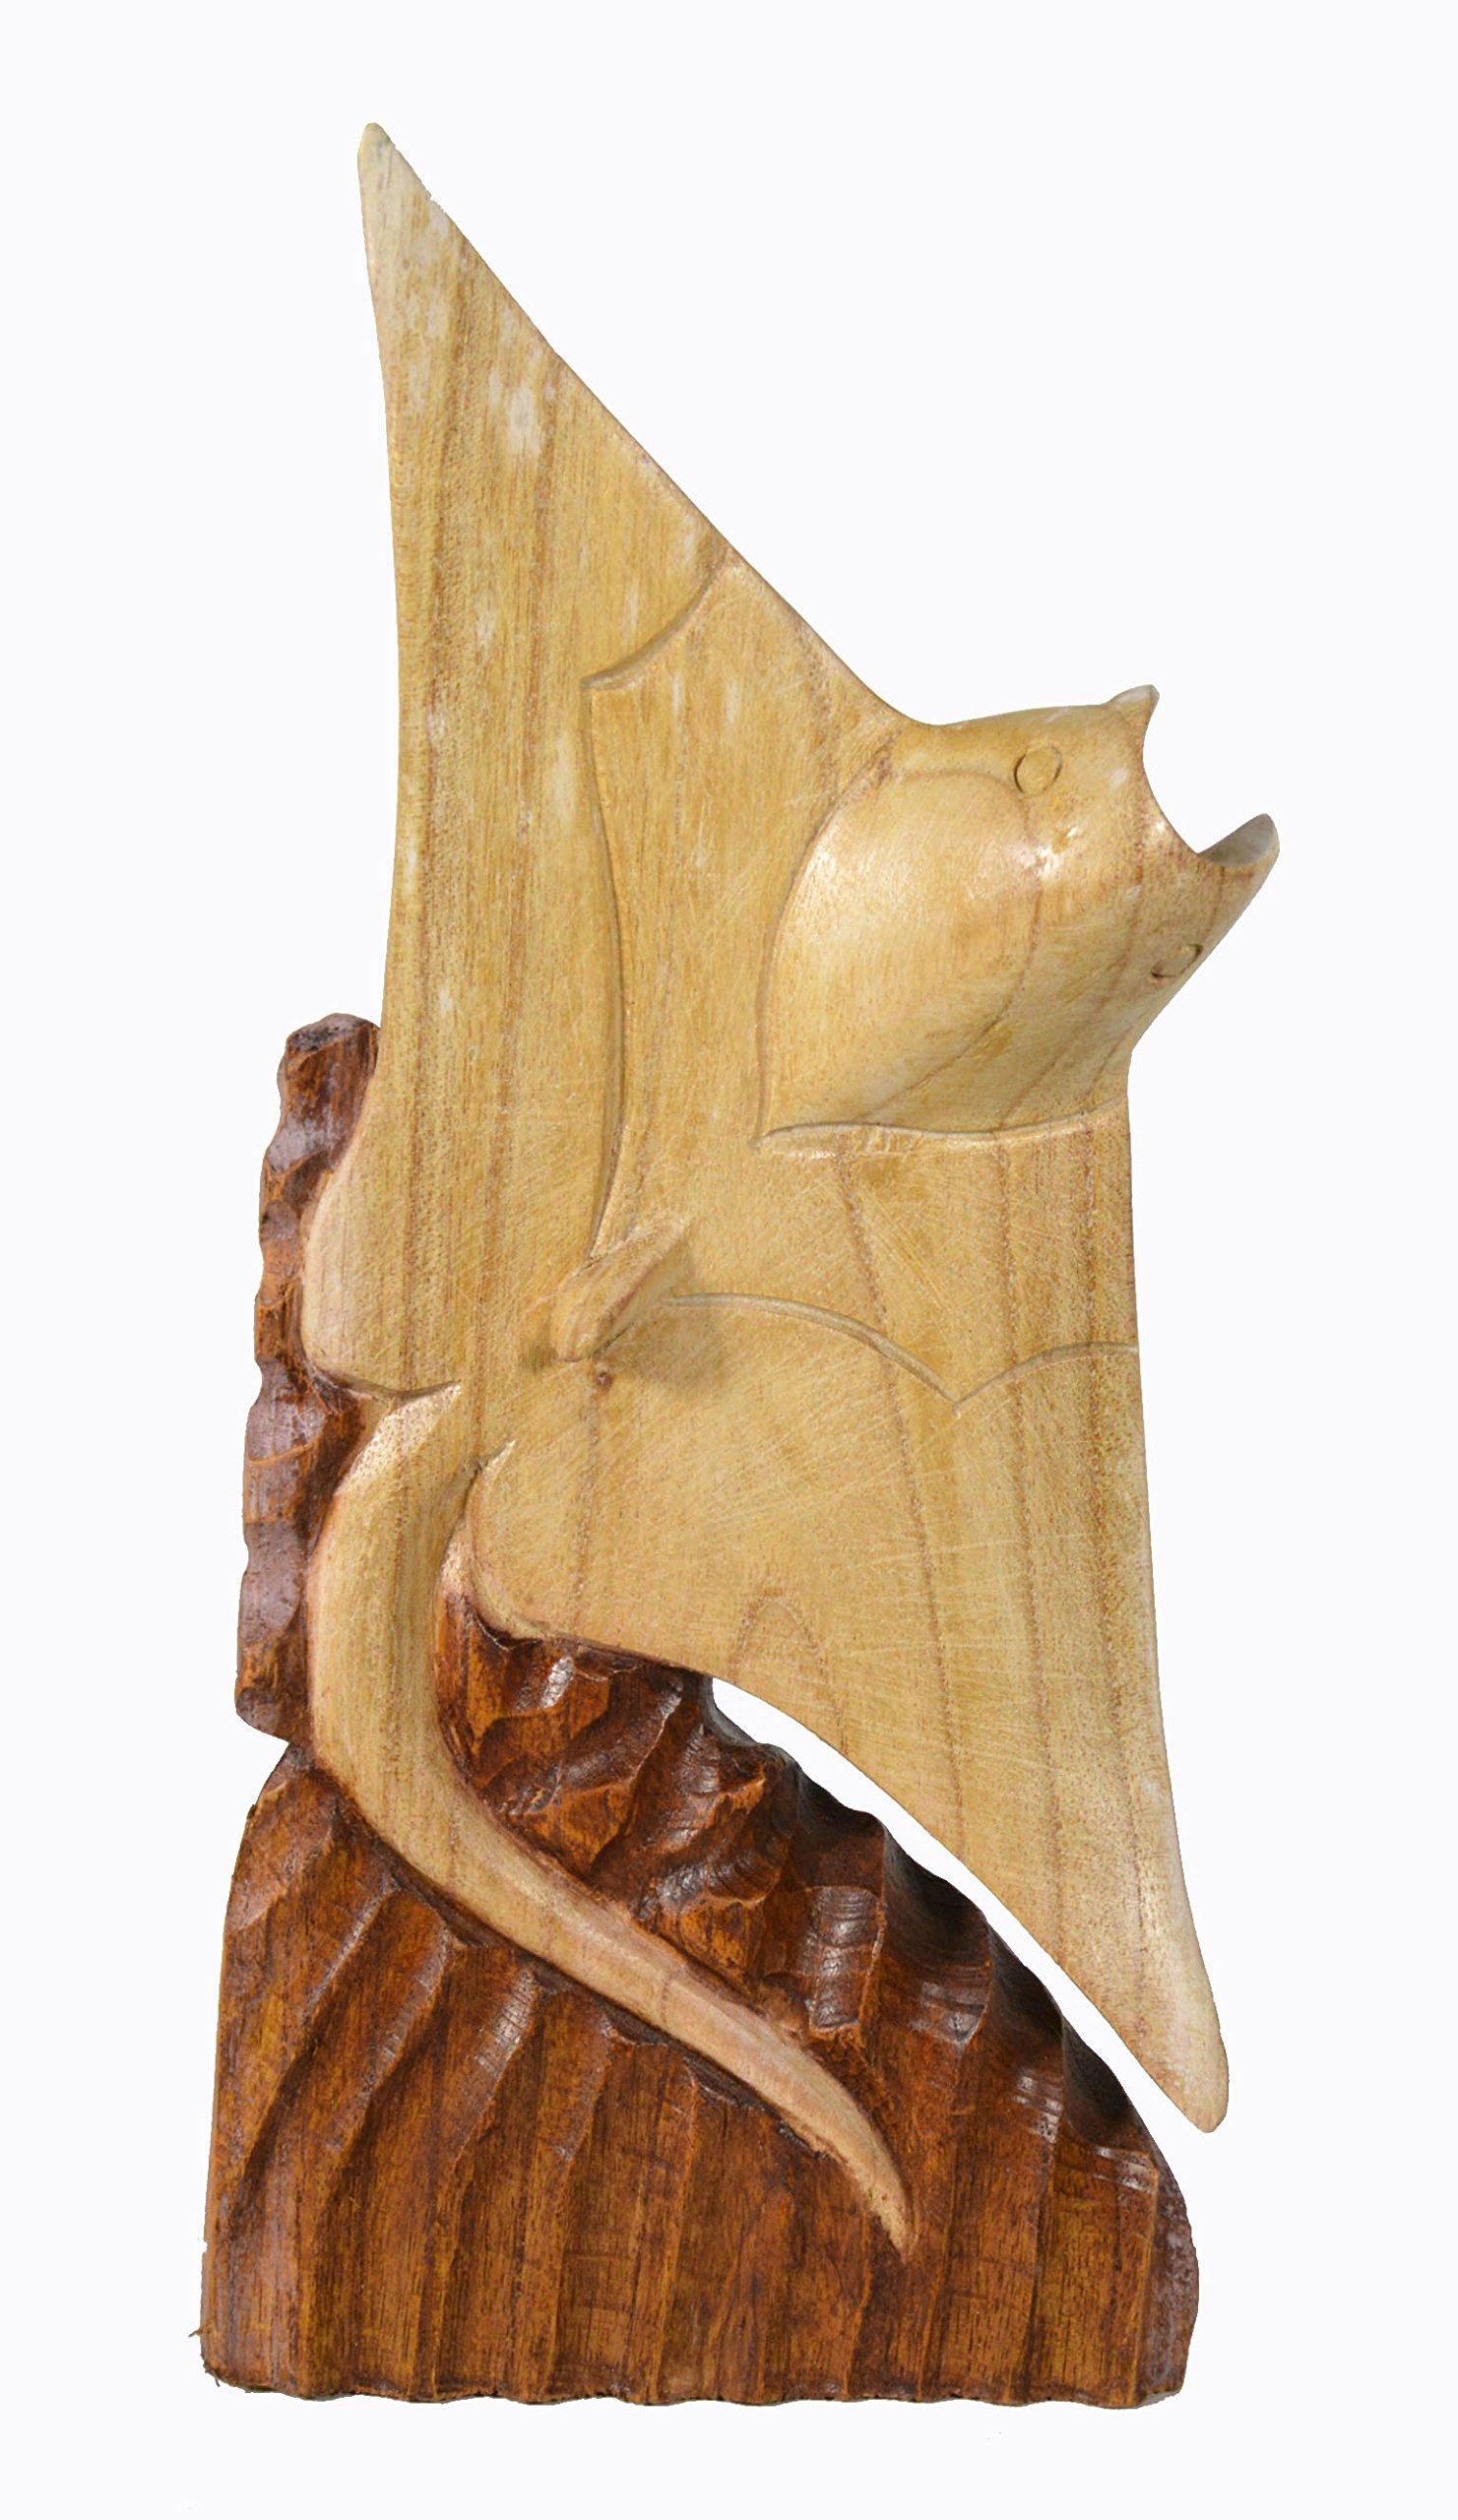 12'' Hand Carved Mahogany Stingray Manta Ray Table Top Carving Sculpture Ocean Sea Nautical Decor